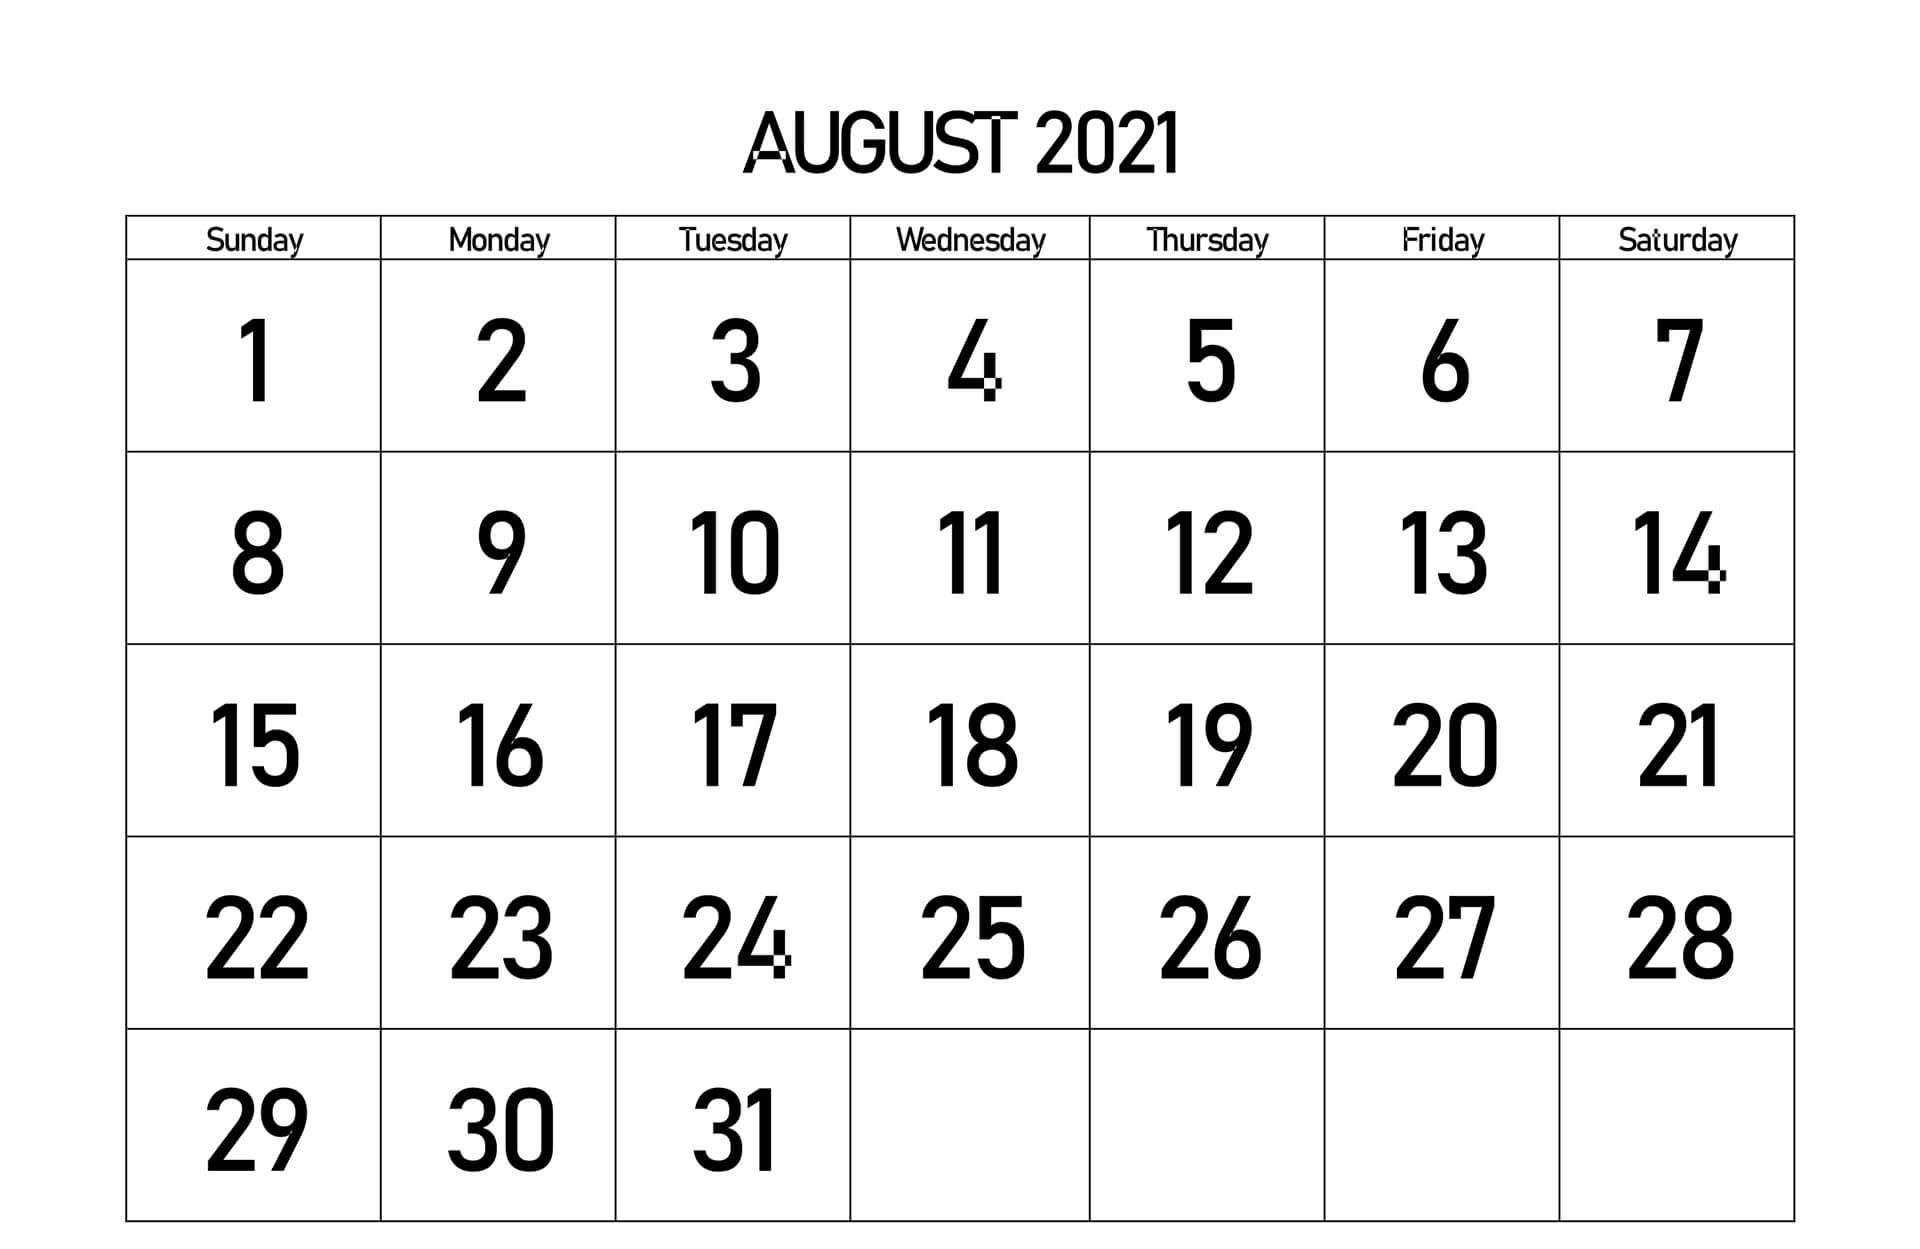 August 2021 Calendar SA